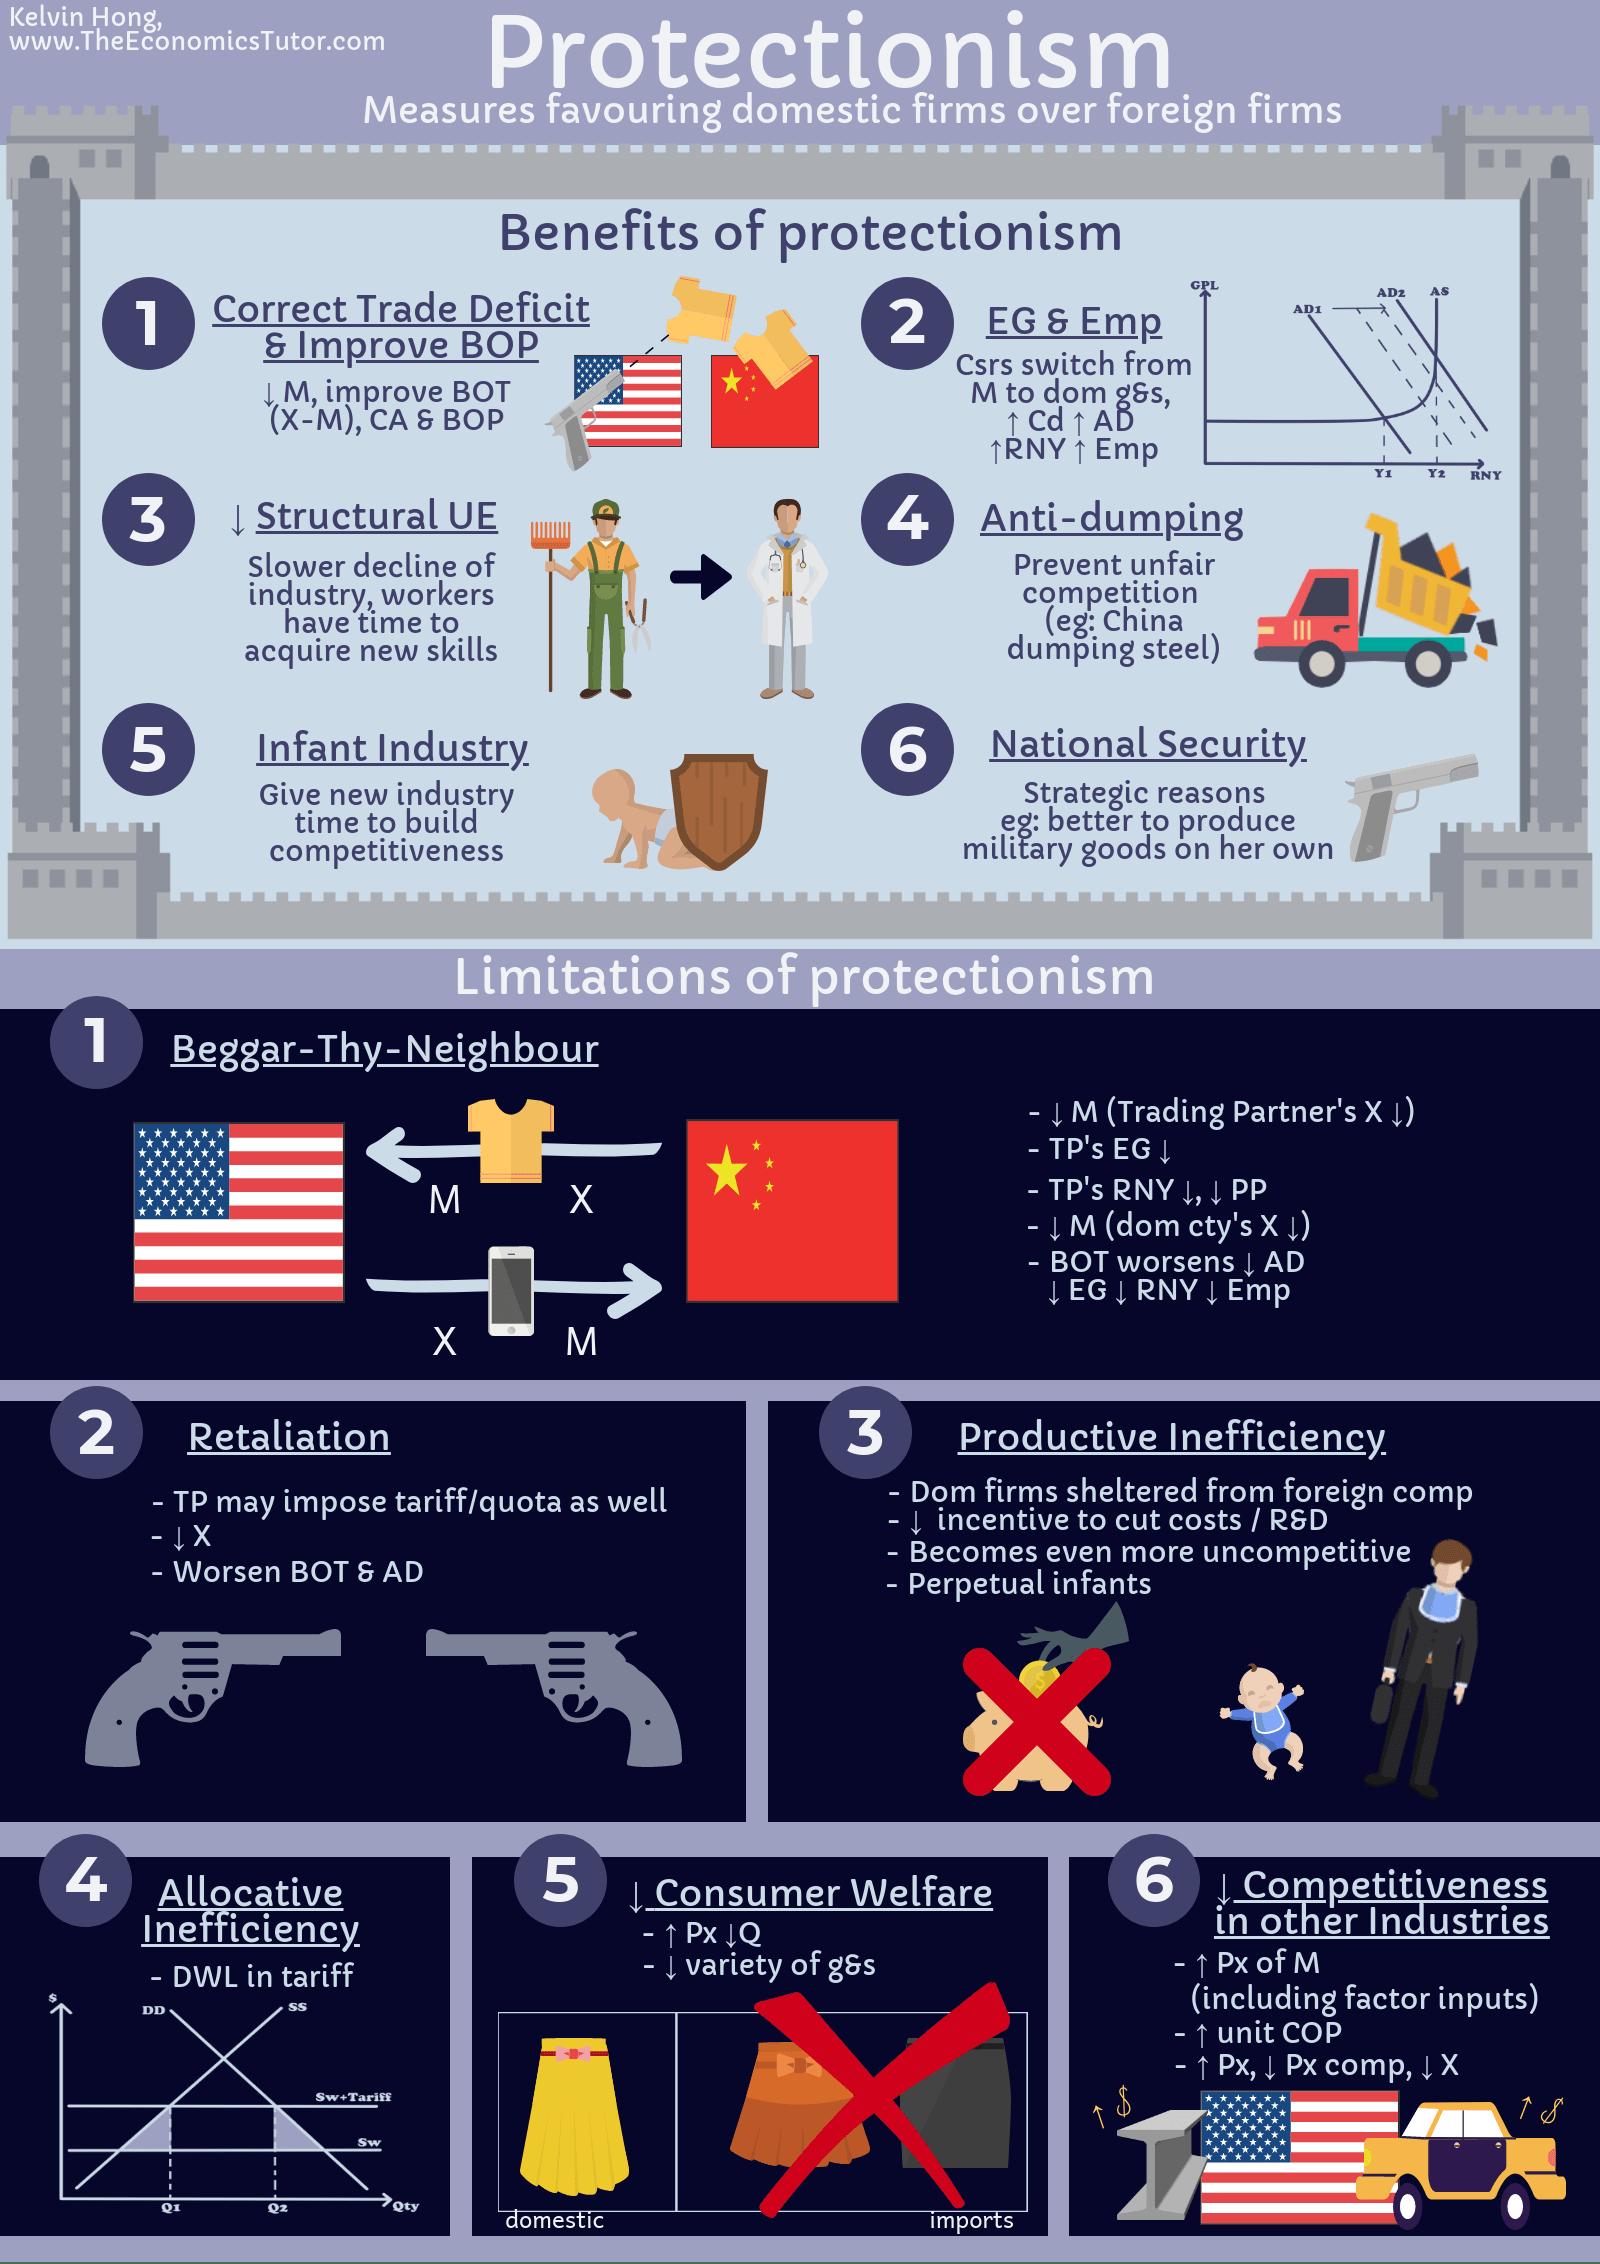 Protectionism v4 min IB Economics Tuition